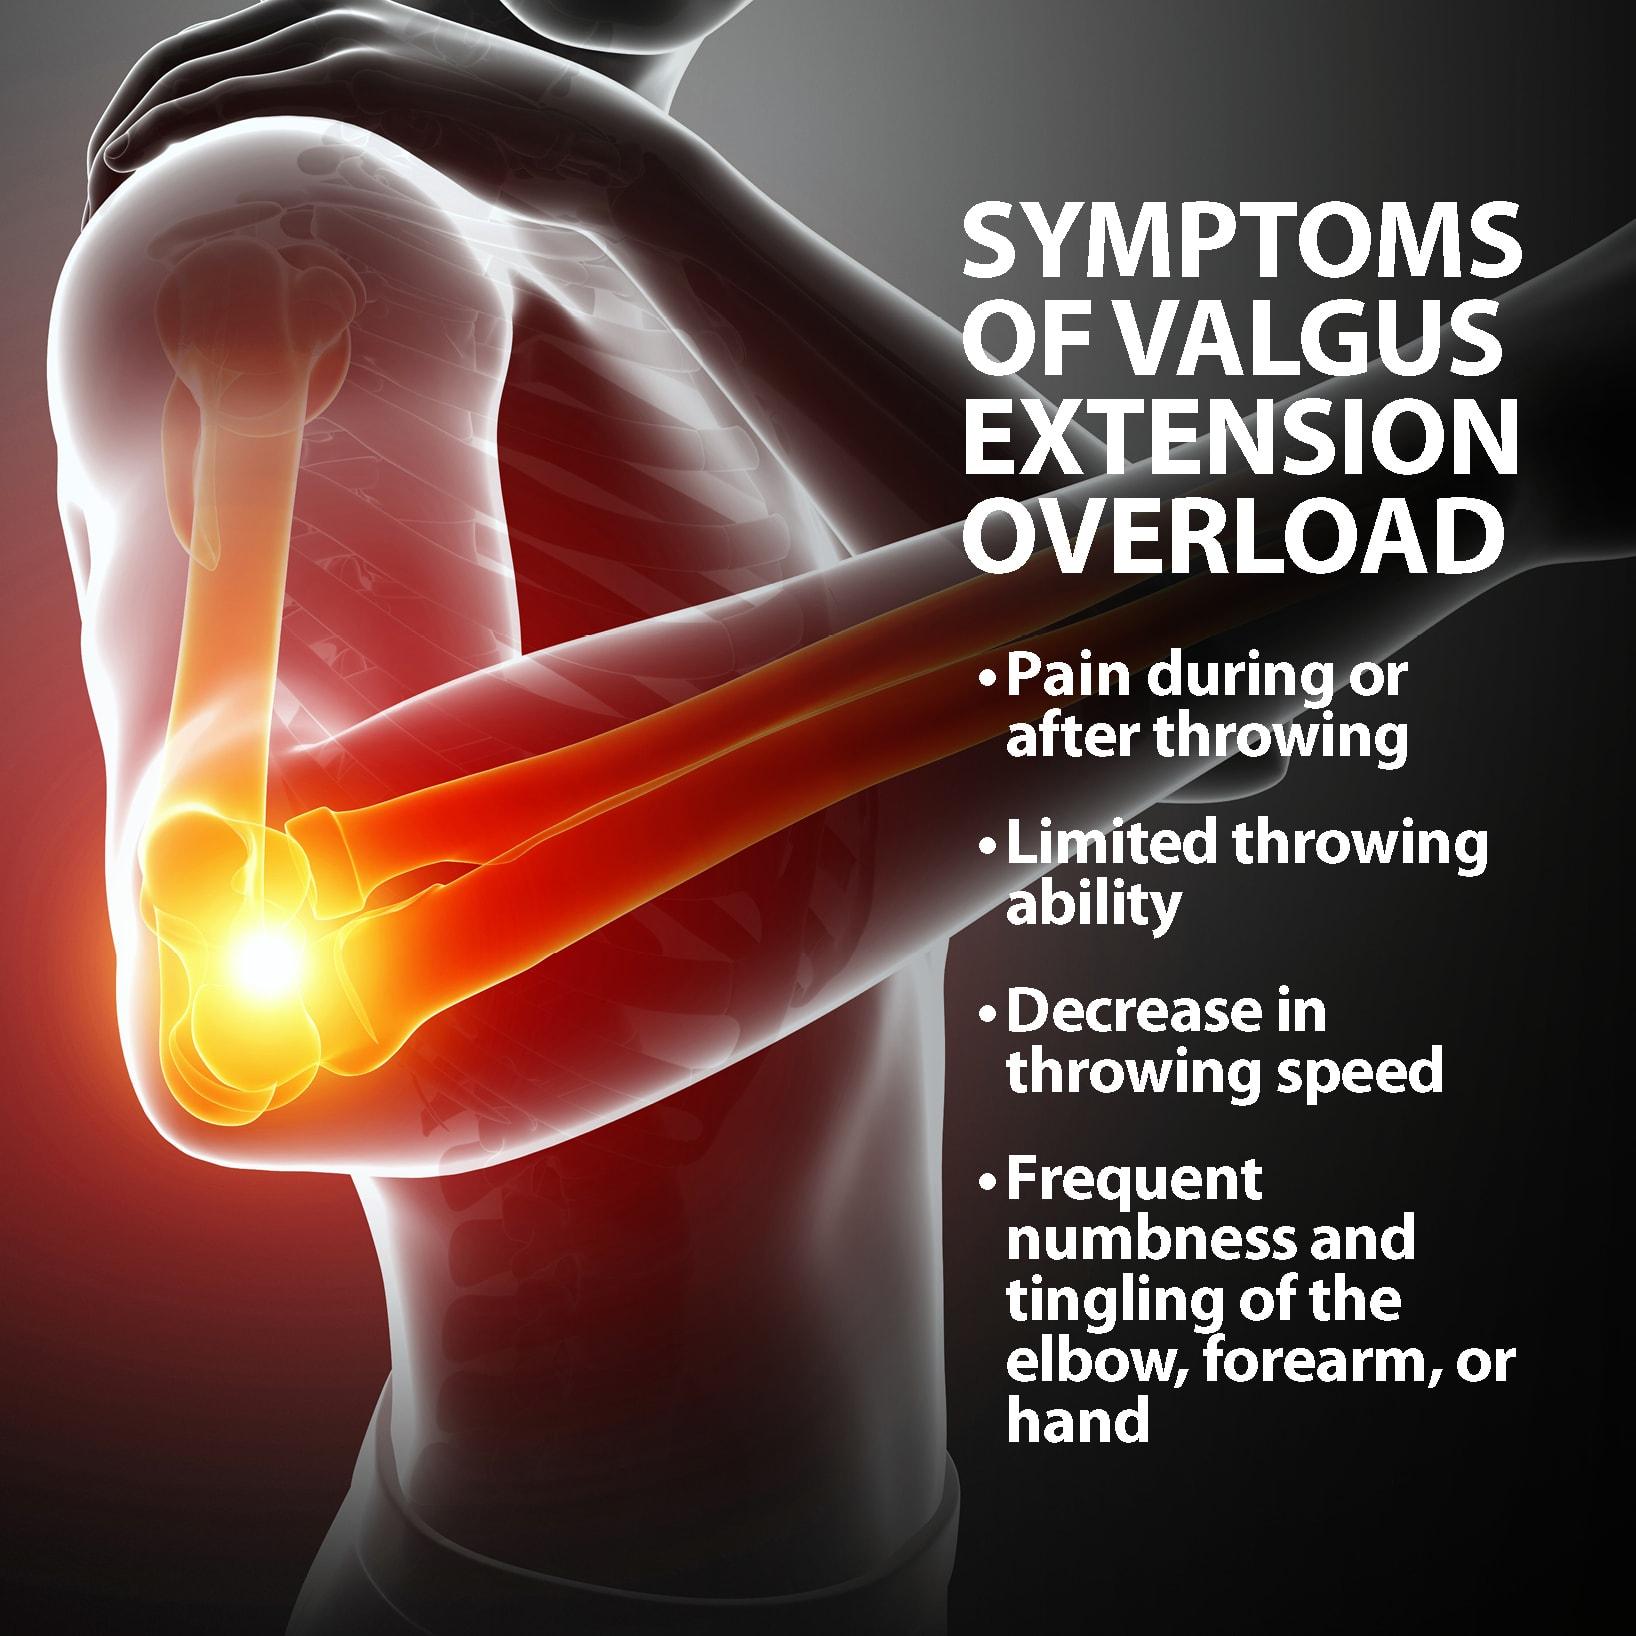 hight resolution of valgus extension overload symptoms